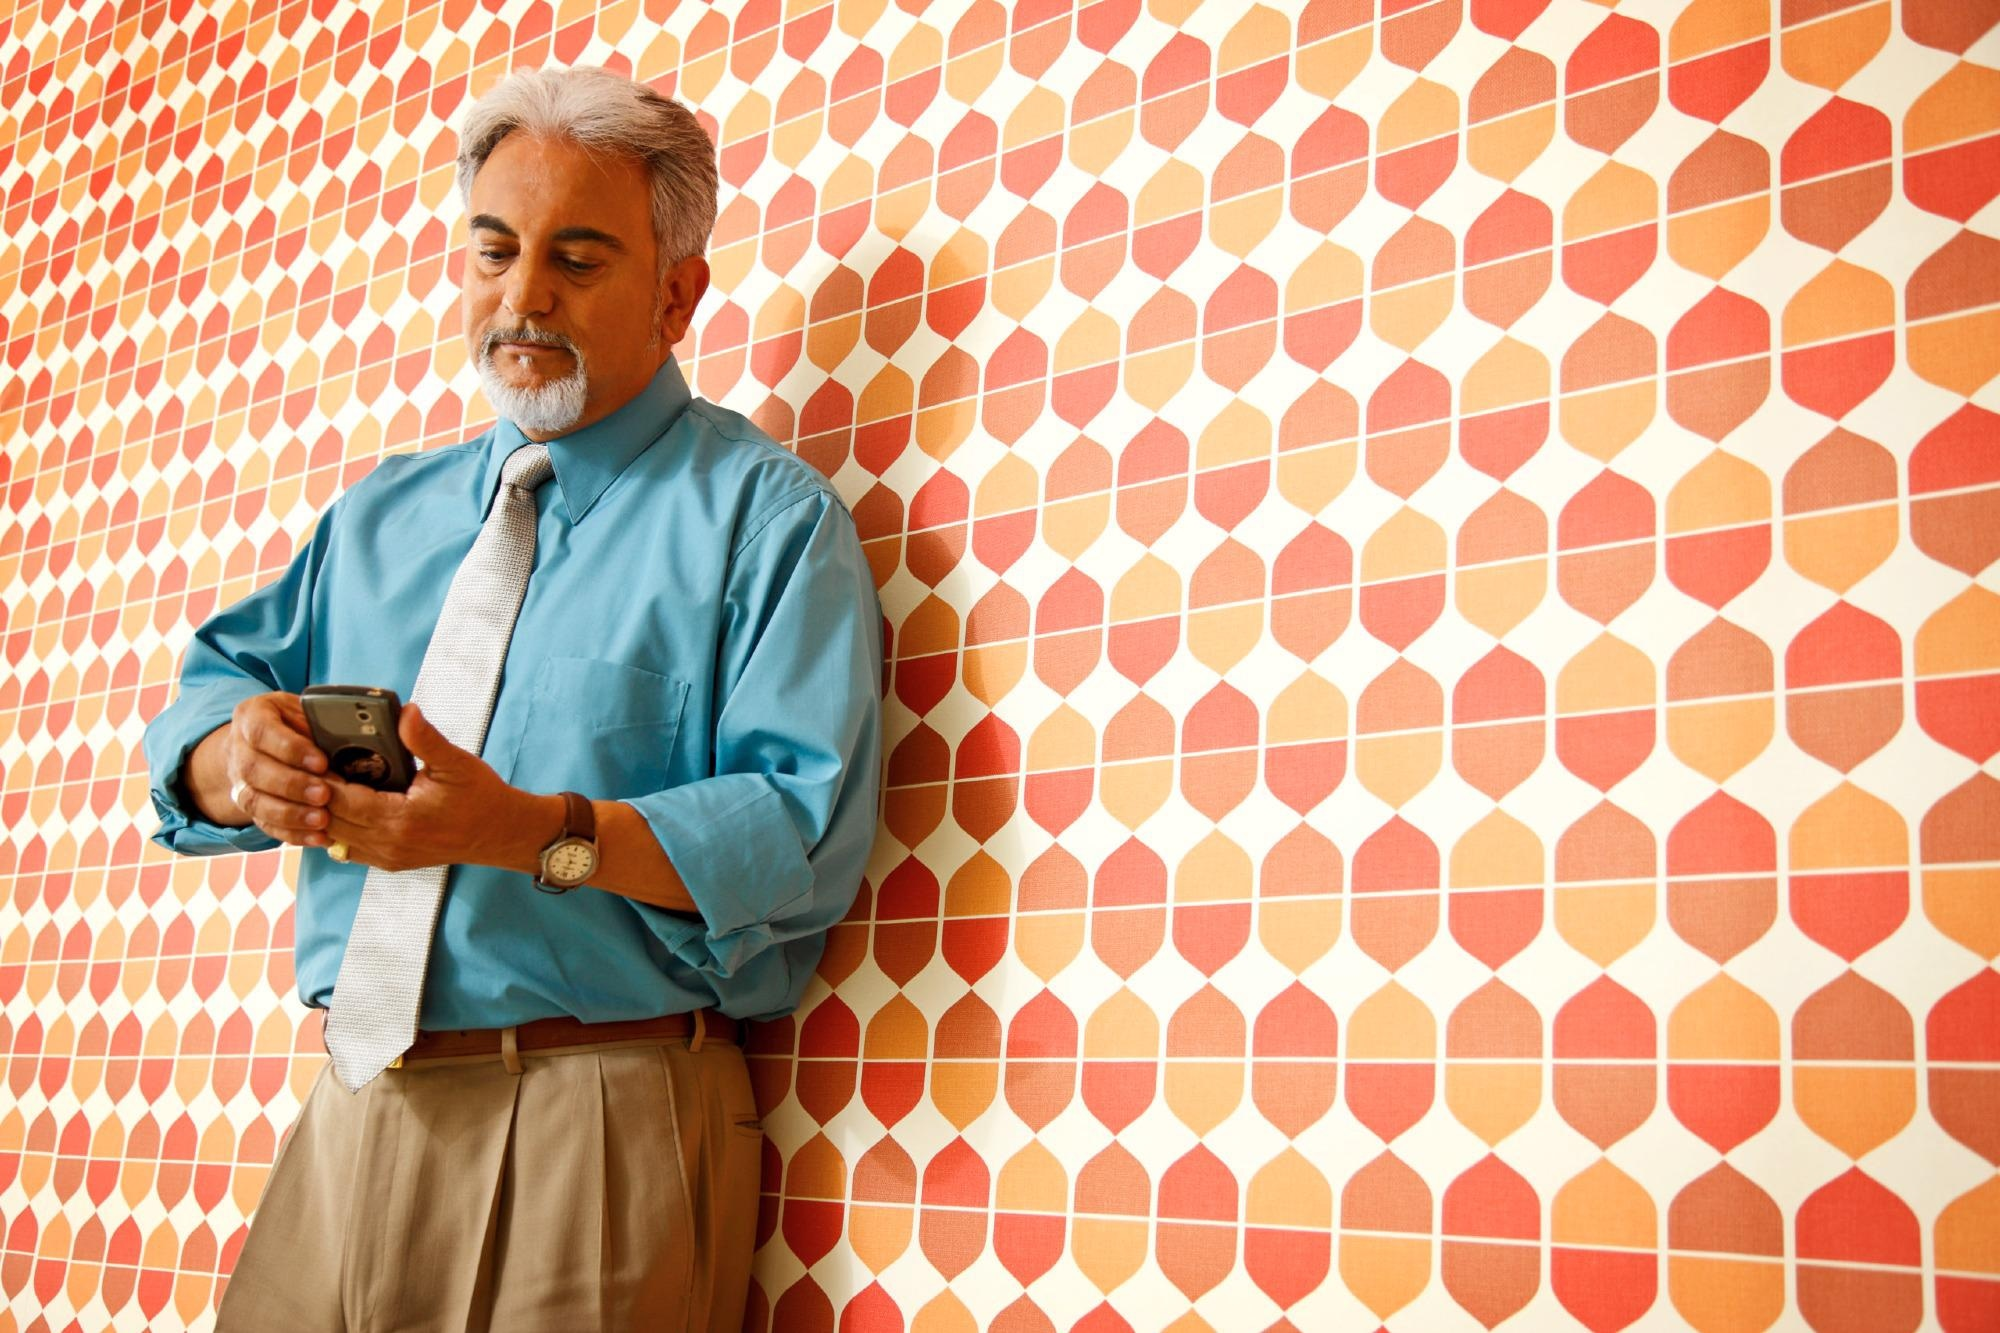 Continuous Glucose Monitors Improve Blood Sugar Control in Certain Patients